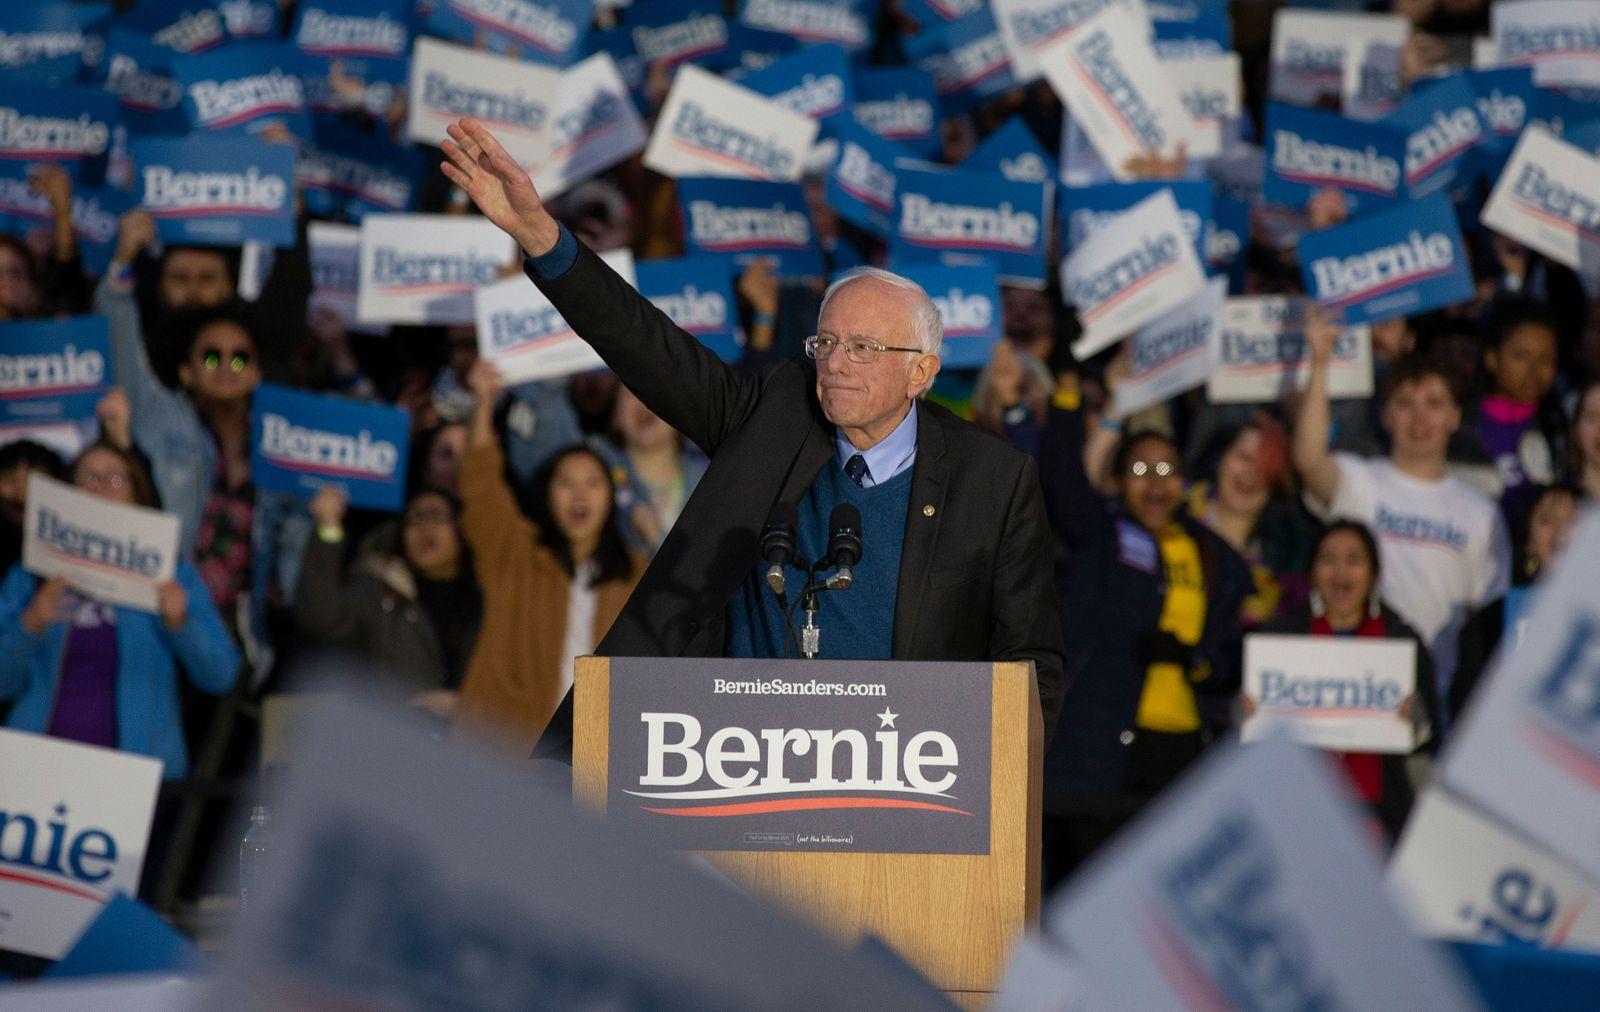 Democratic presidential candidate Bernie Sanders at Ann Arbor at University of Michigan rally, USA - 08 Mar 2020